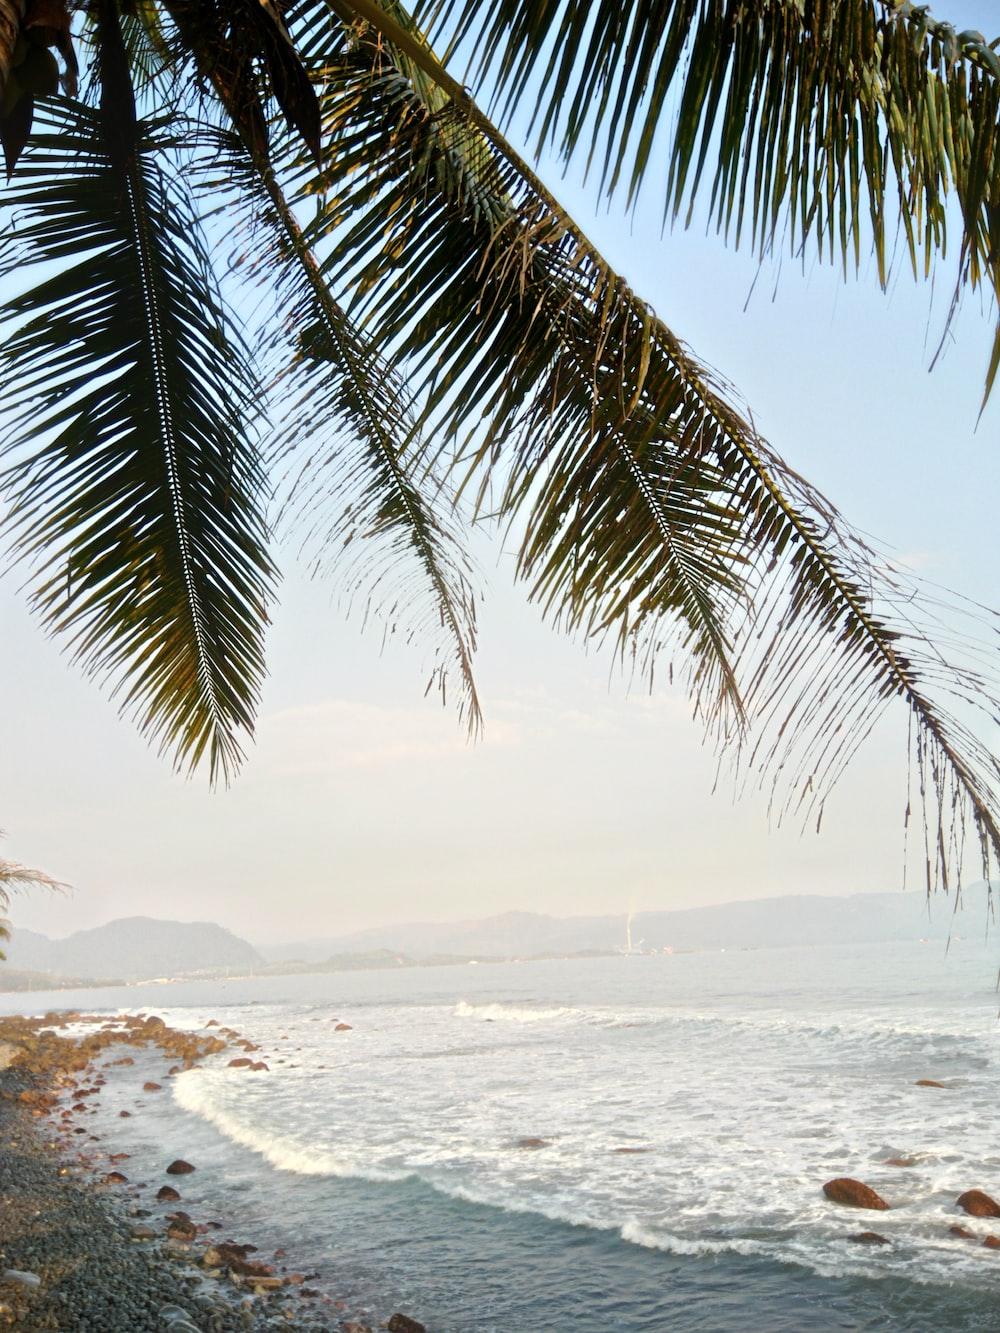 green palm tree across body of water